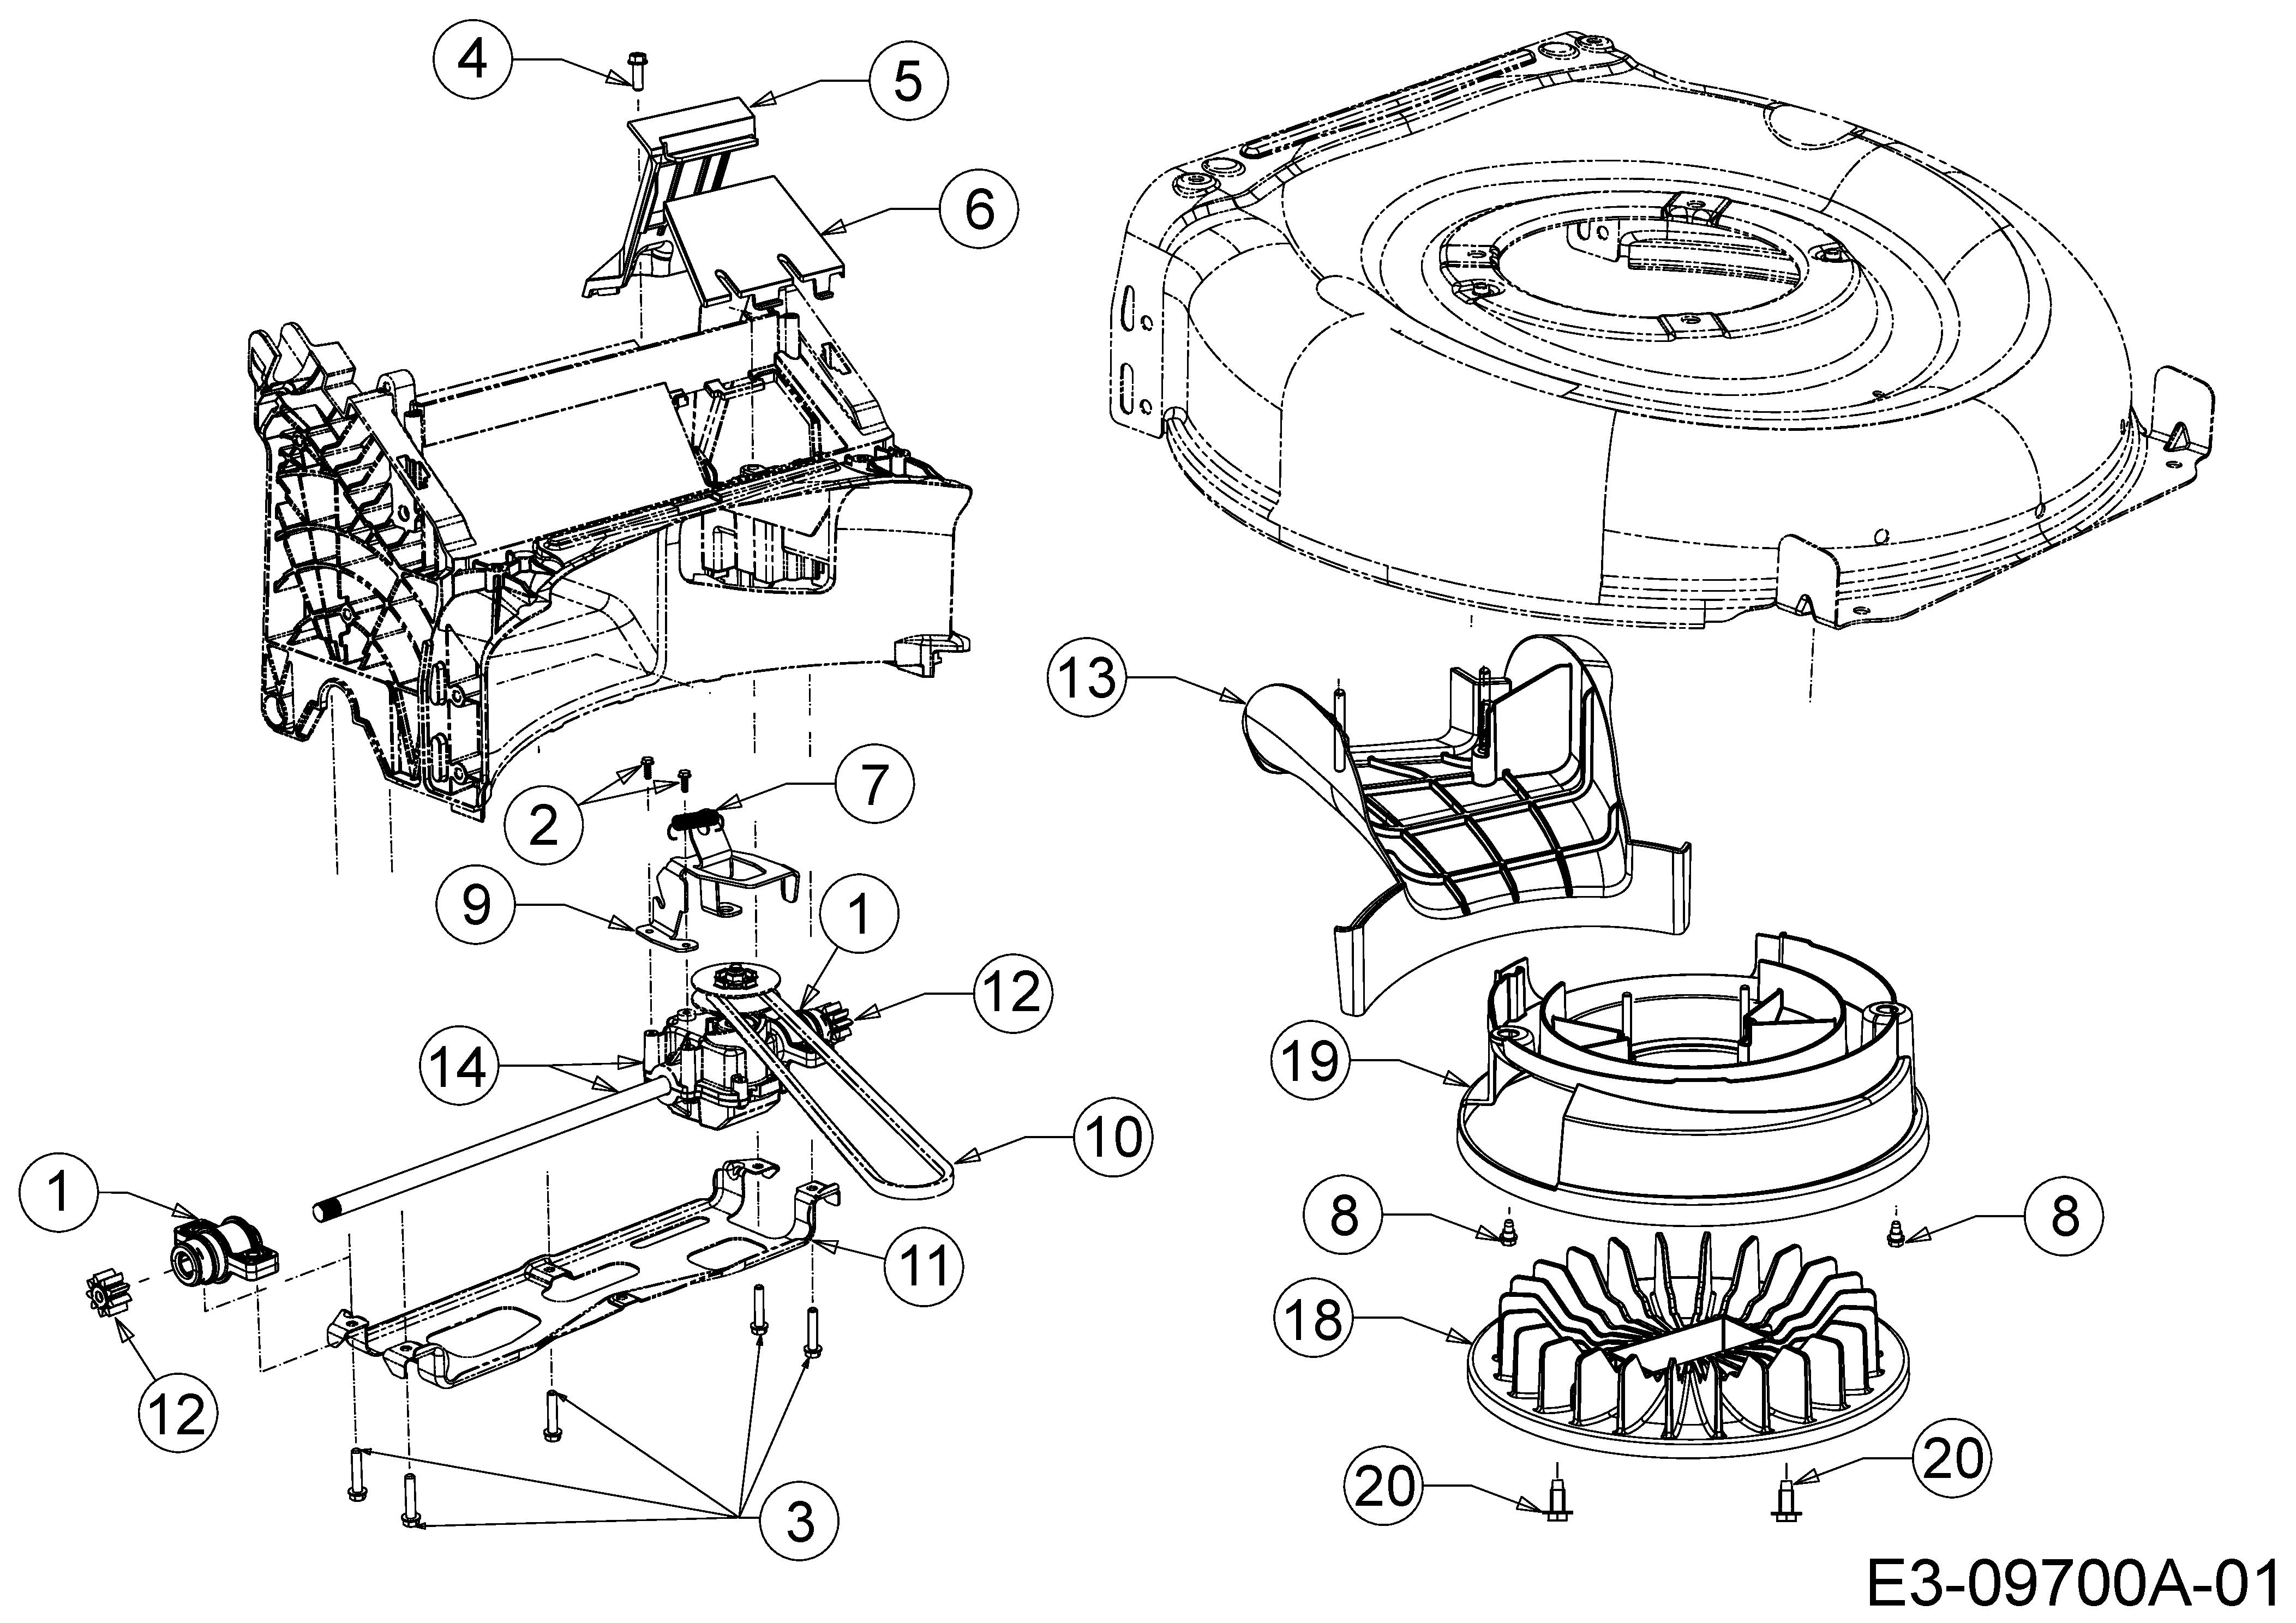 Wolf Garten A 530 Ahw Getriebe Keilriemen Lfterrad 12b Pvkc650 2016 Case Engine Diagram Ersatzteile